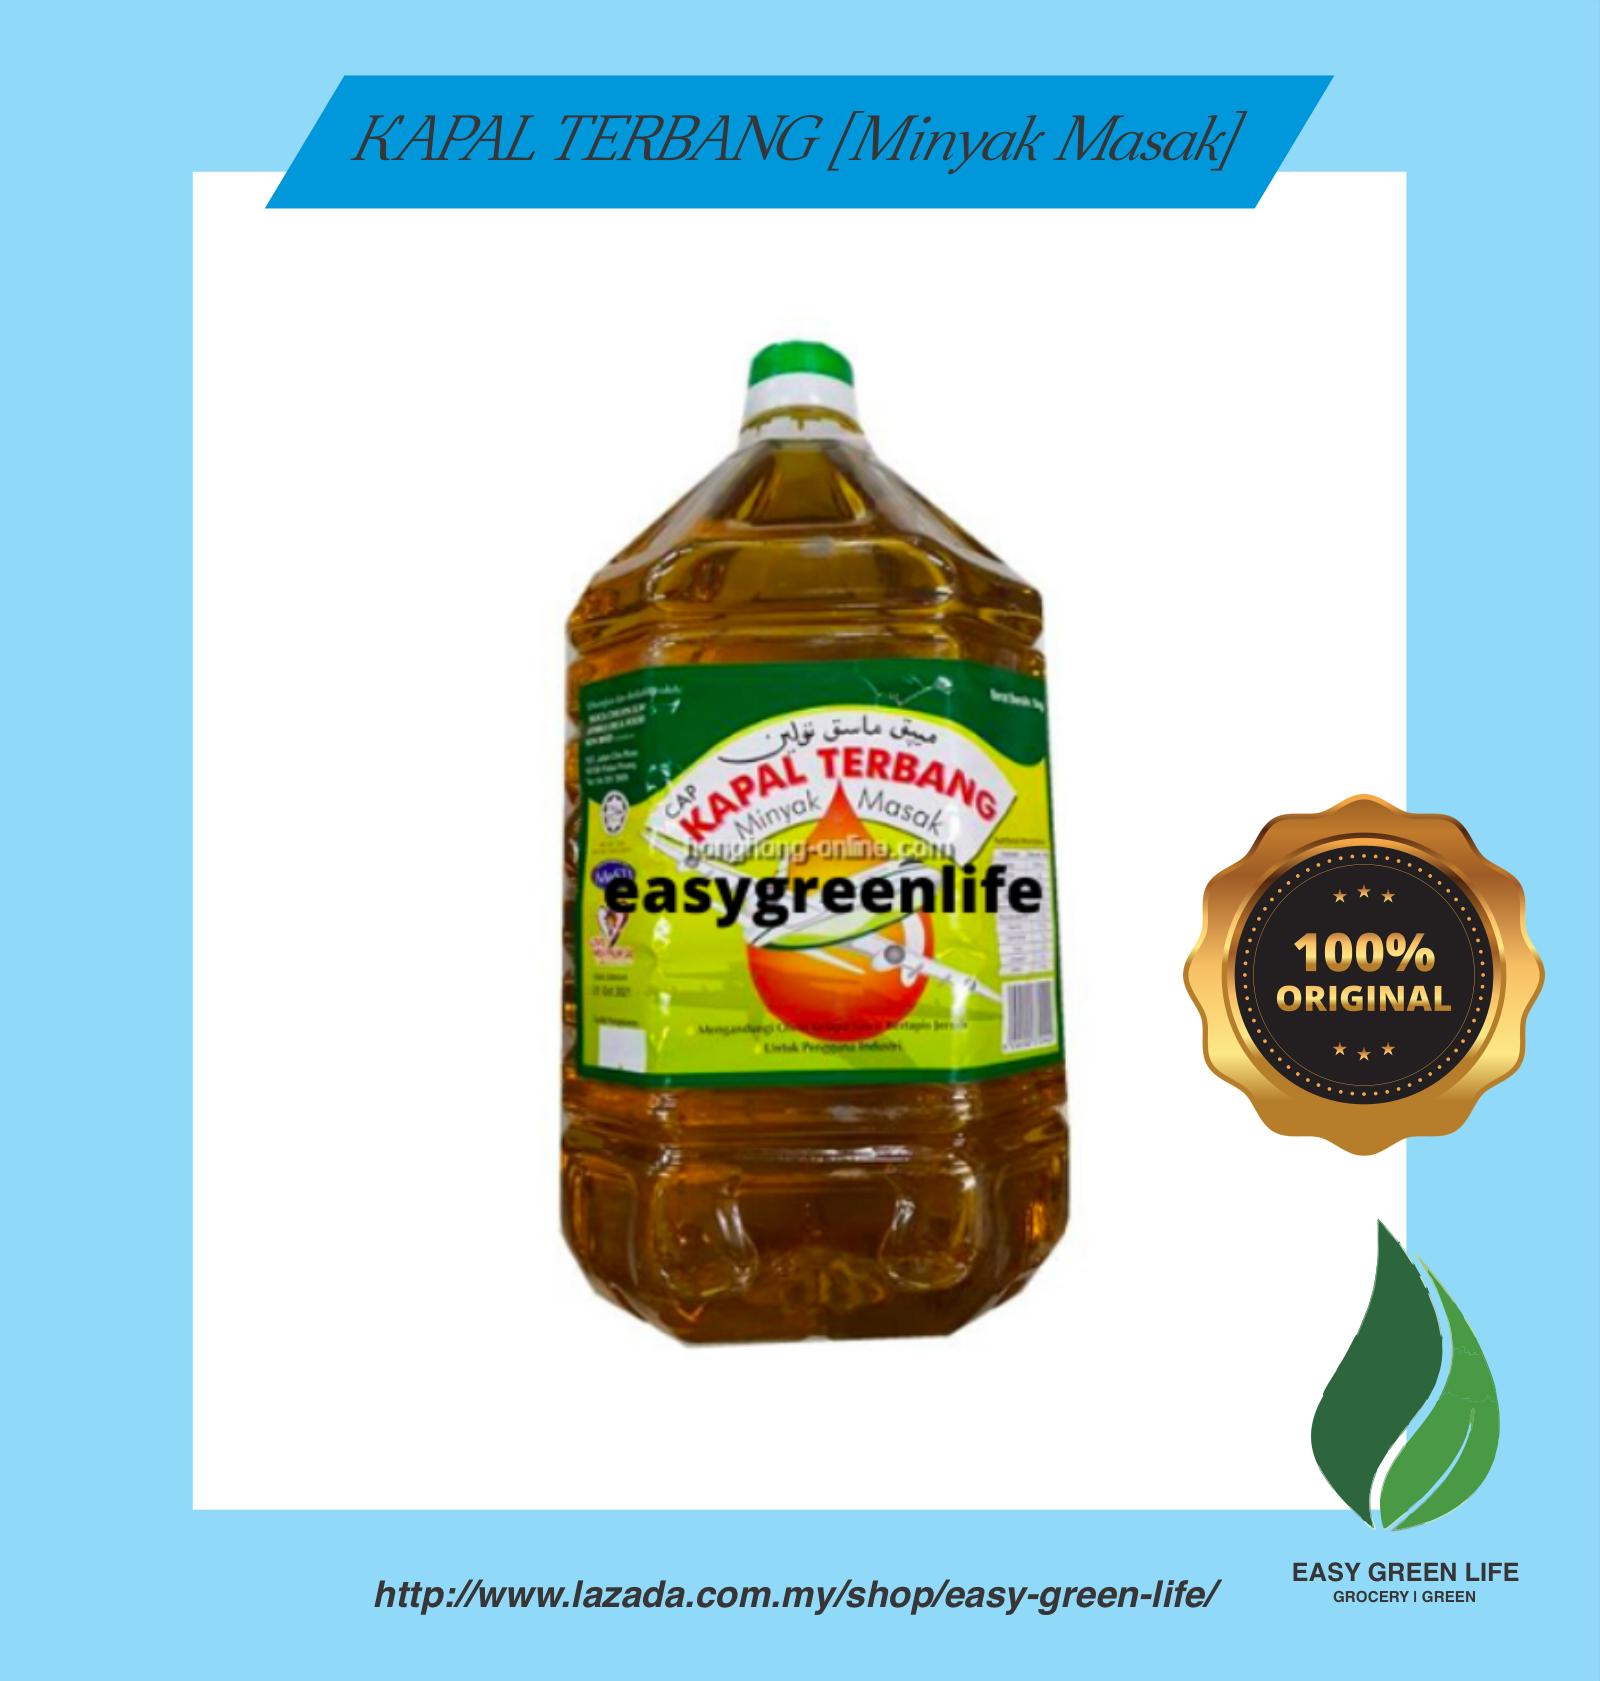 EGL Cooking Oil (Kapal Terbang Brand) Minyak Masak